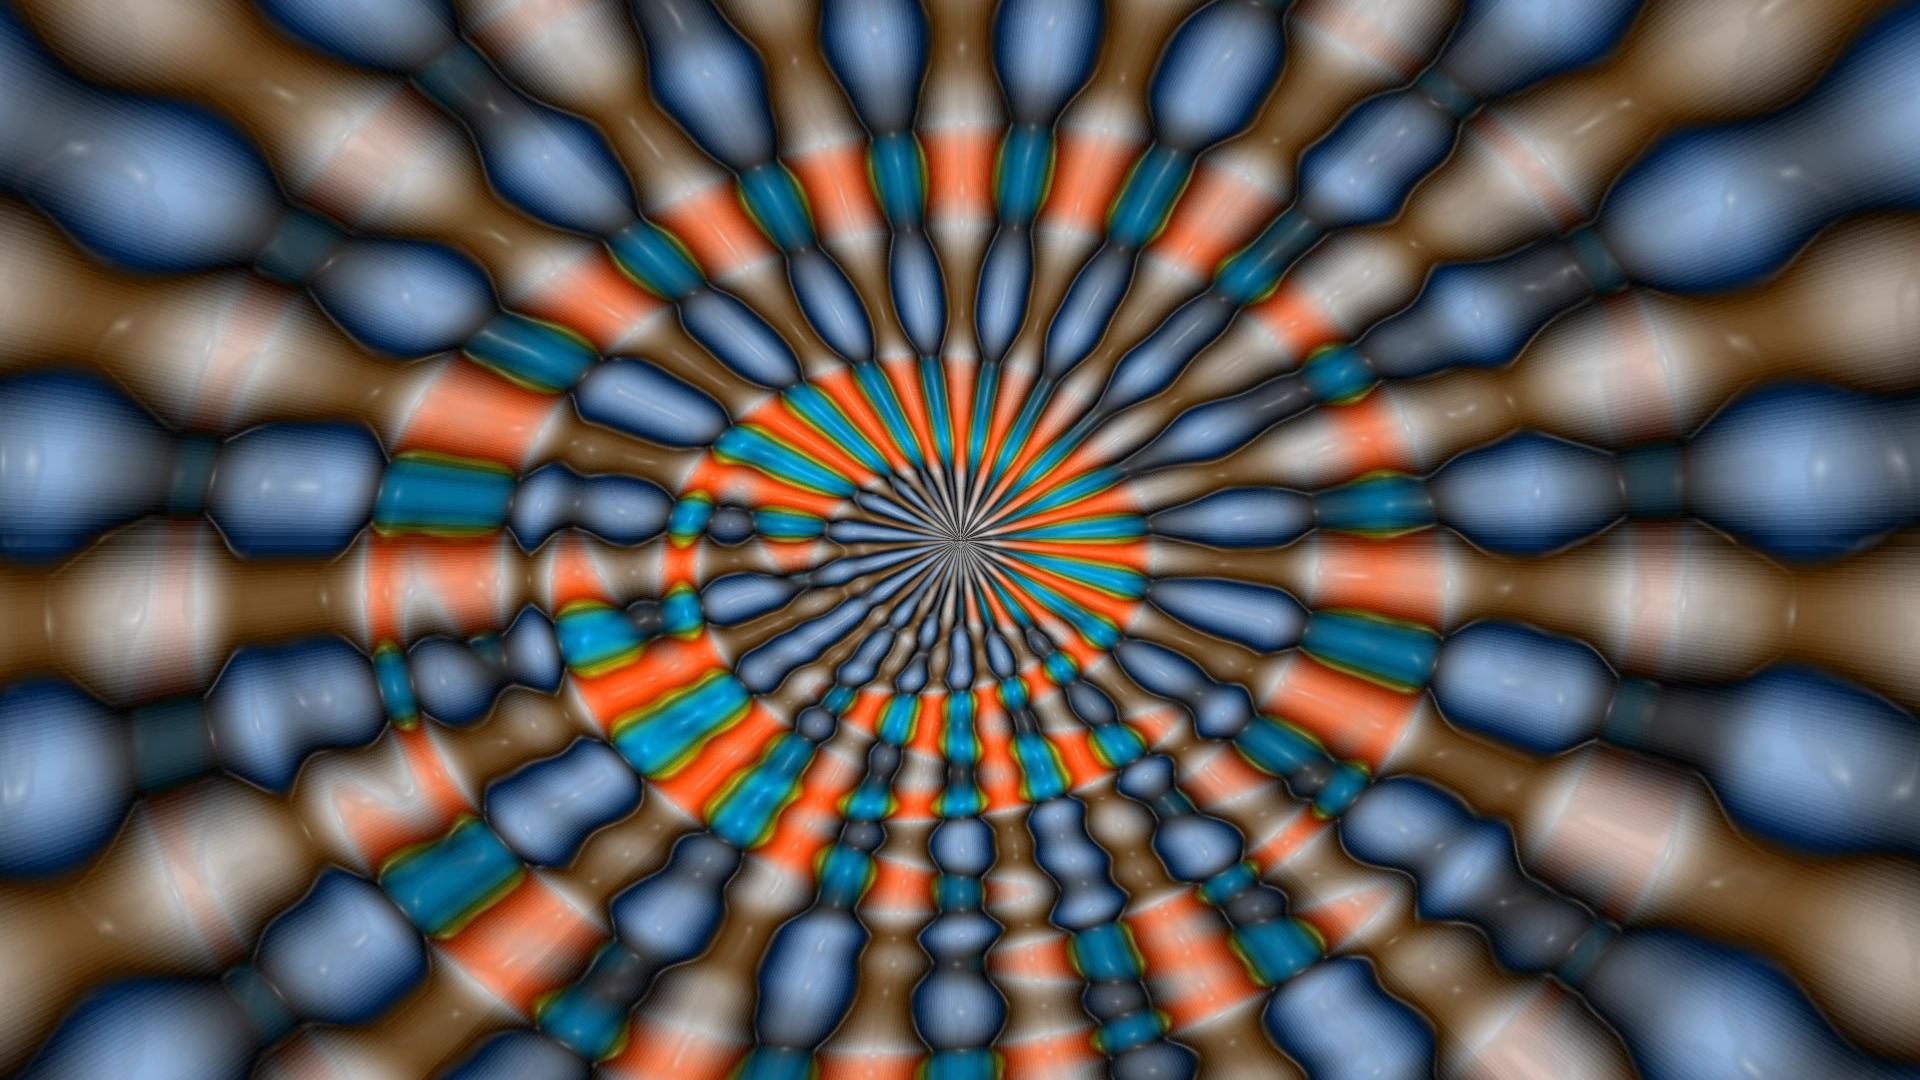 Best-Optical-Illusion-Full-HD-p-Illusion-wallpaper-wp3603298